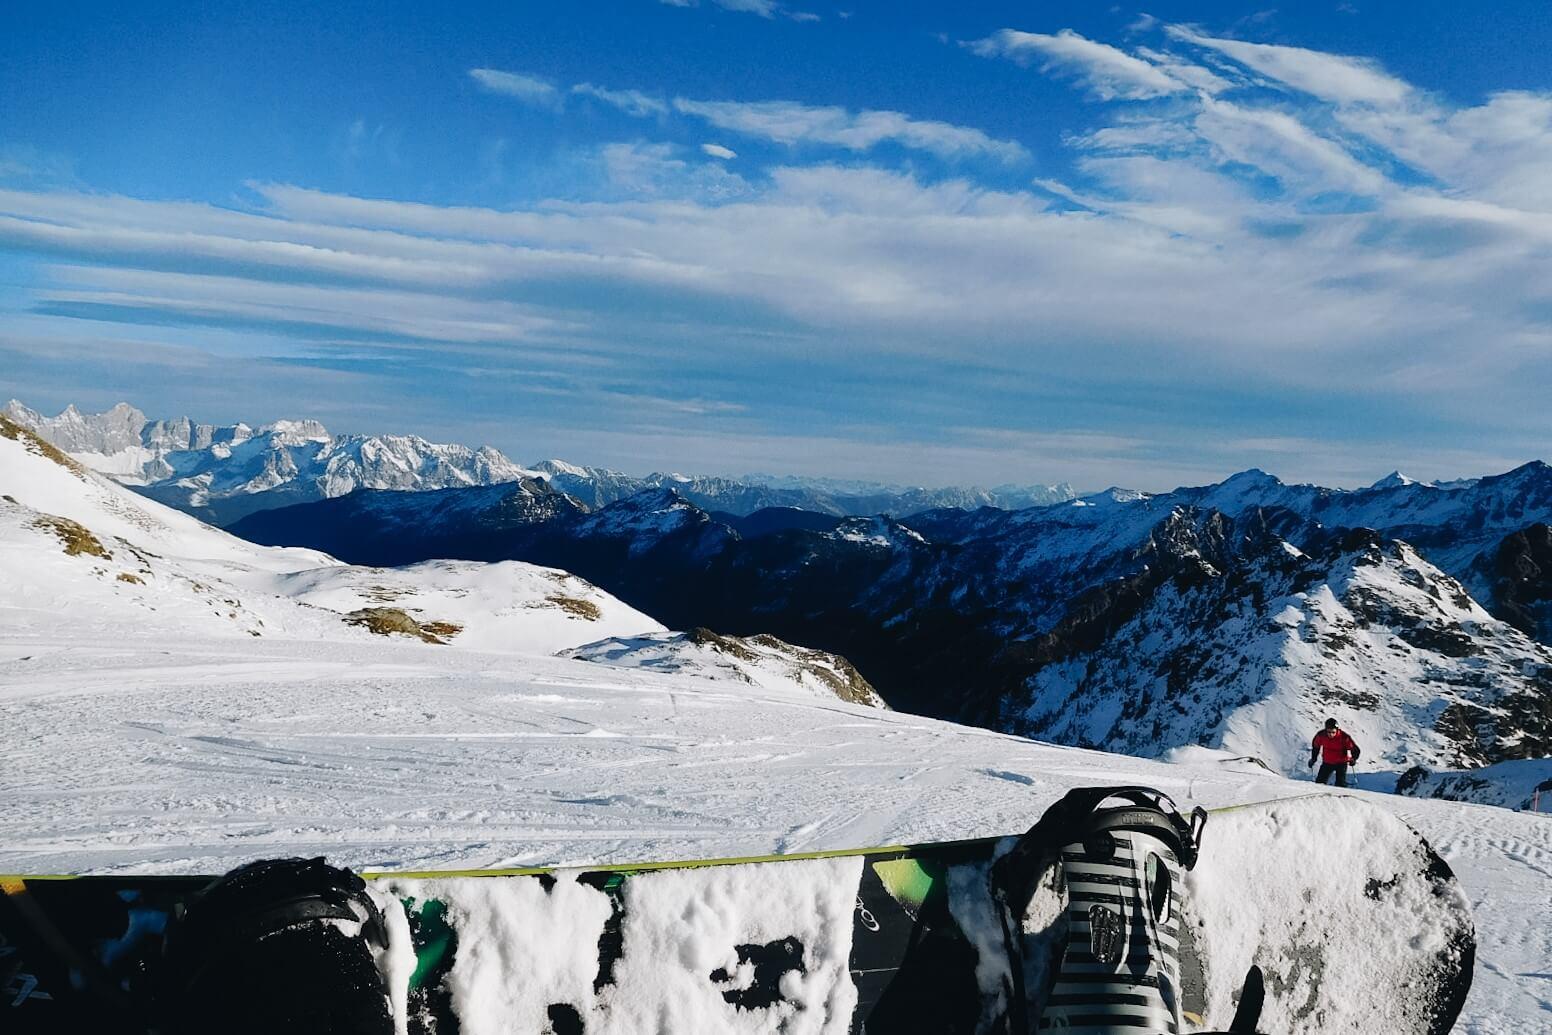 Snowboard na tle gór.